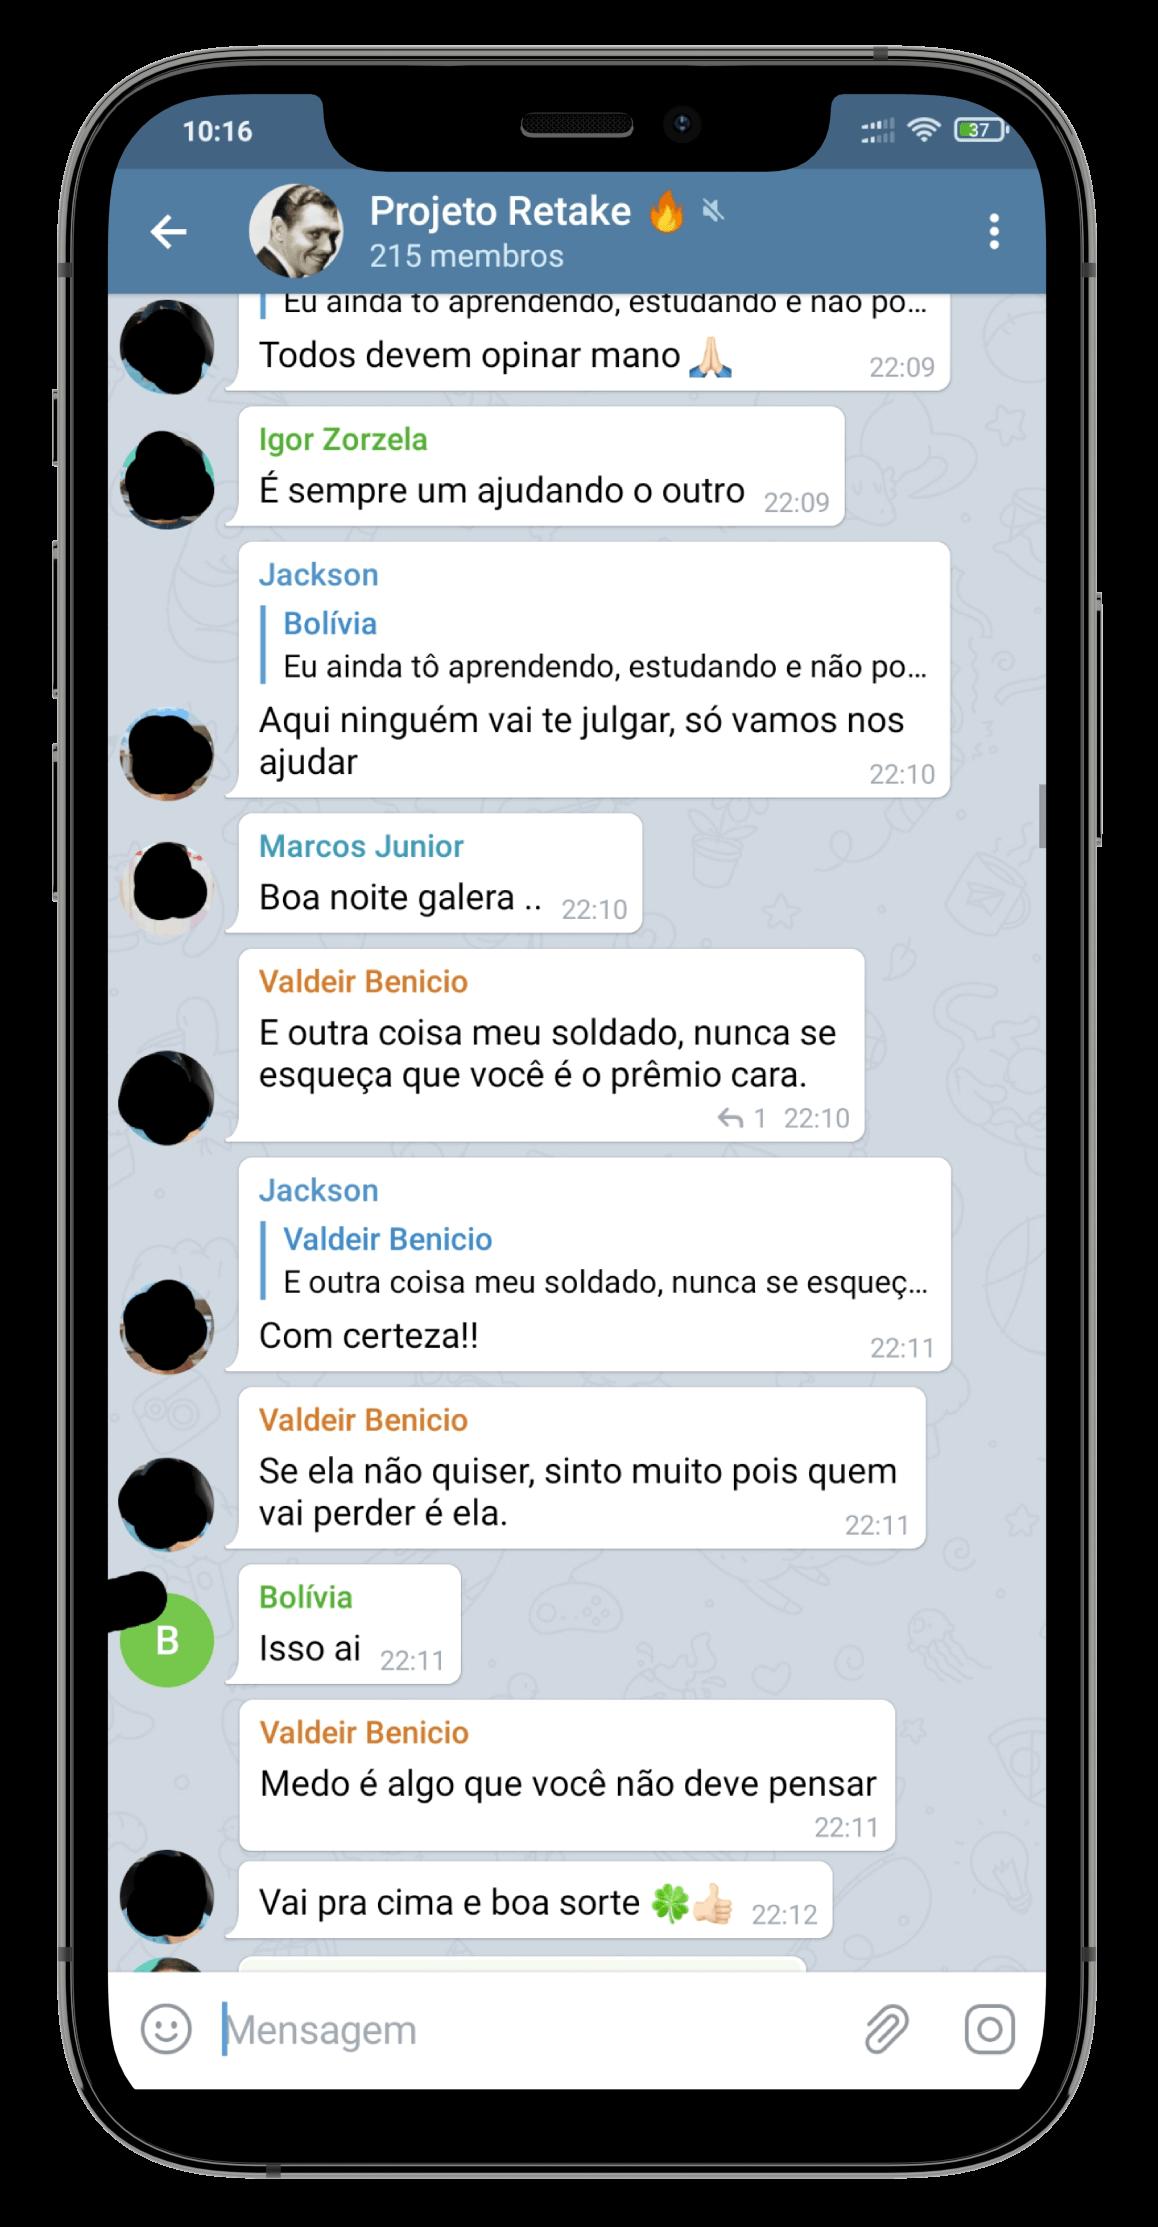 projeto-retake-telegram-1.png